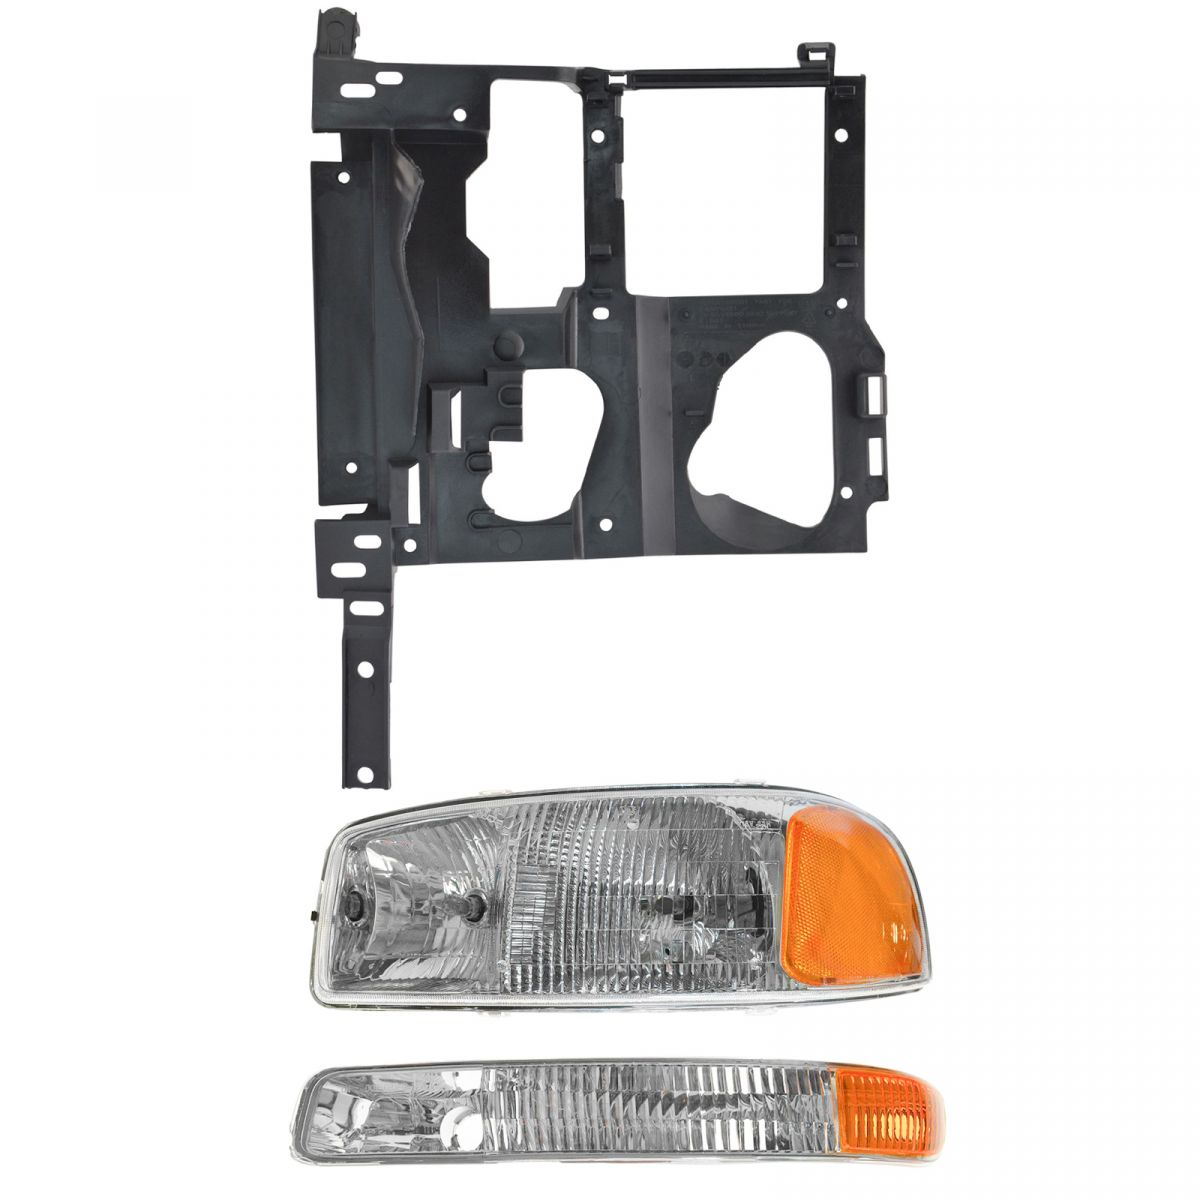 Headlight Parking Light Lamp Mounting Bracket Kit LH Set for 99-02 Chevy Truck